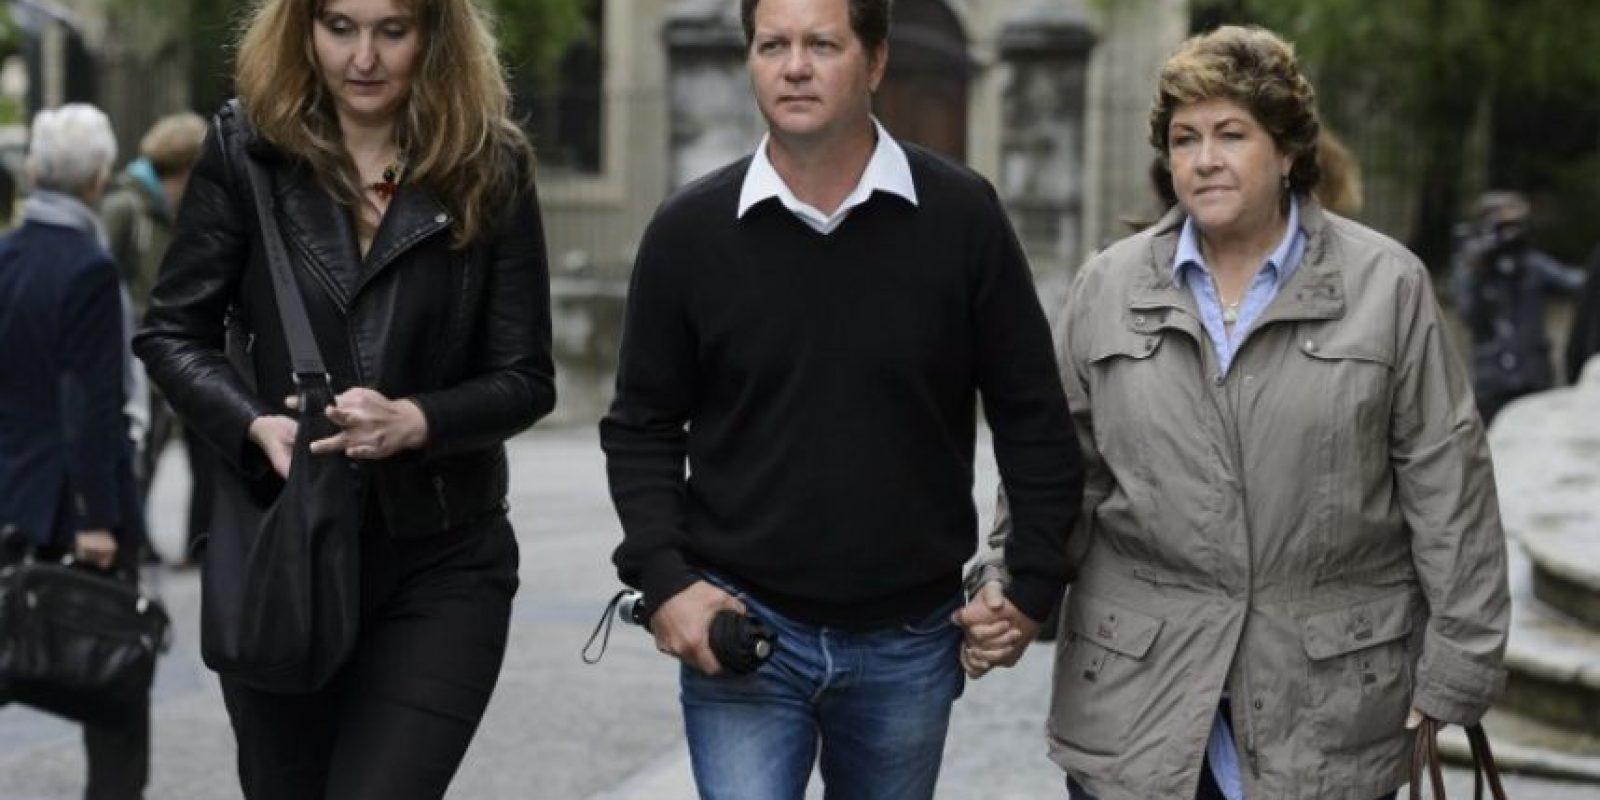 Elizabeth Sperisen, Christian Sperisen y Linda Sperisen, la esposa, hermano y mamá. Foto:AFP